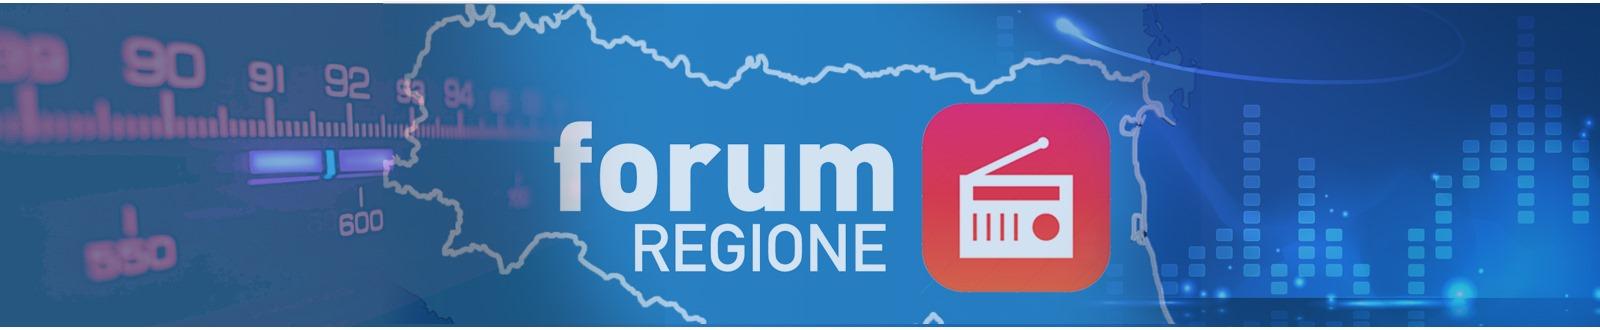 forum-regione